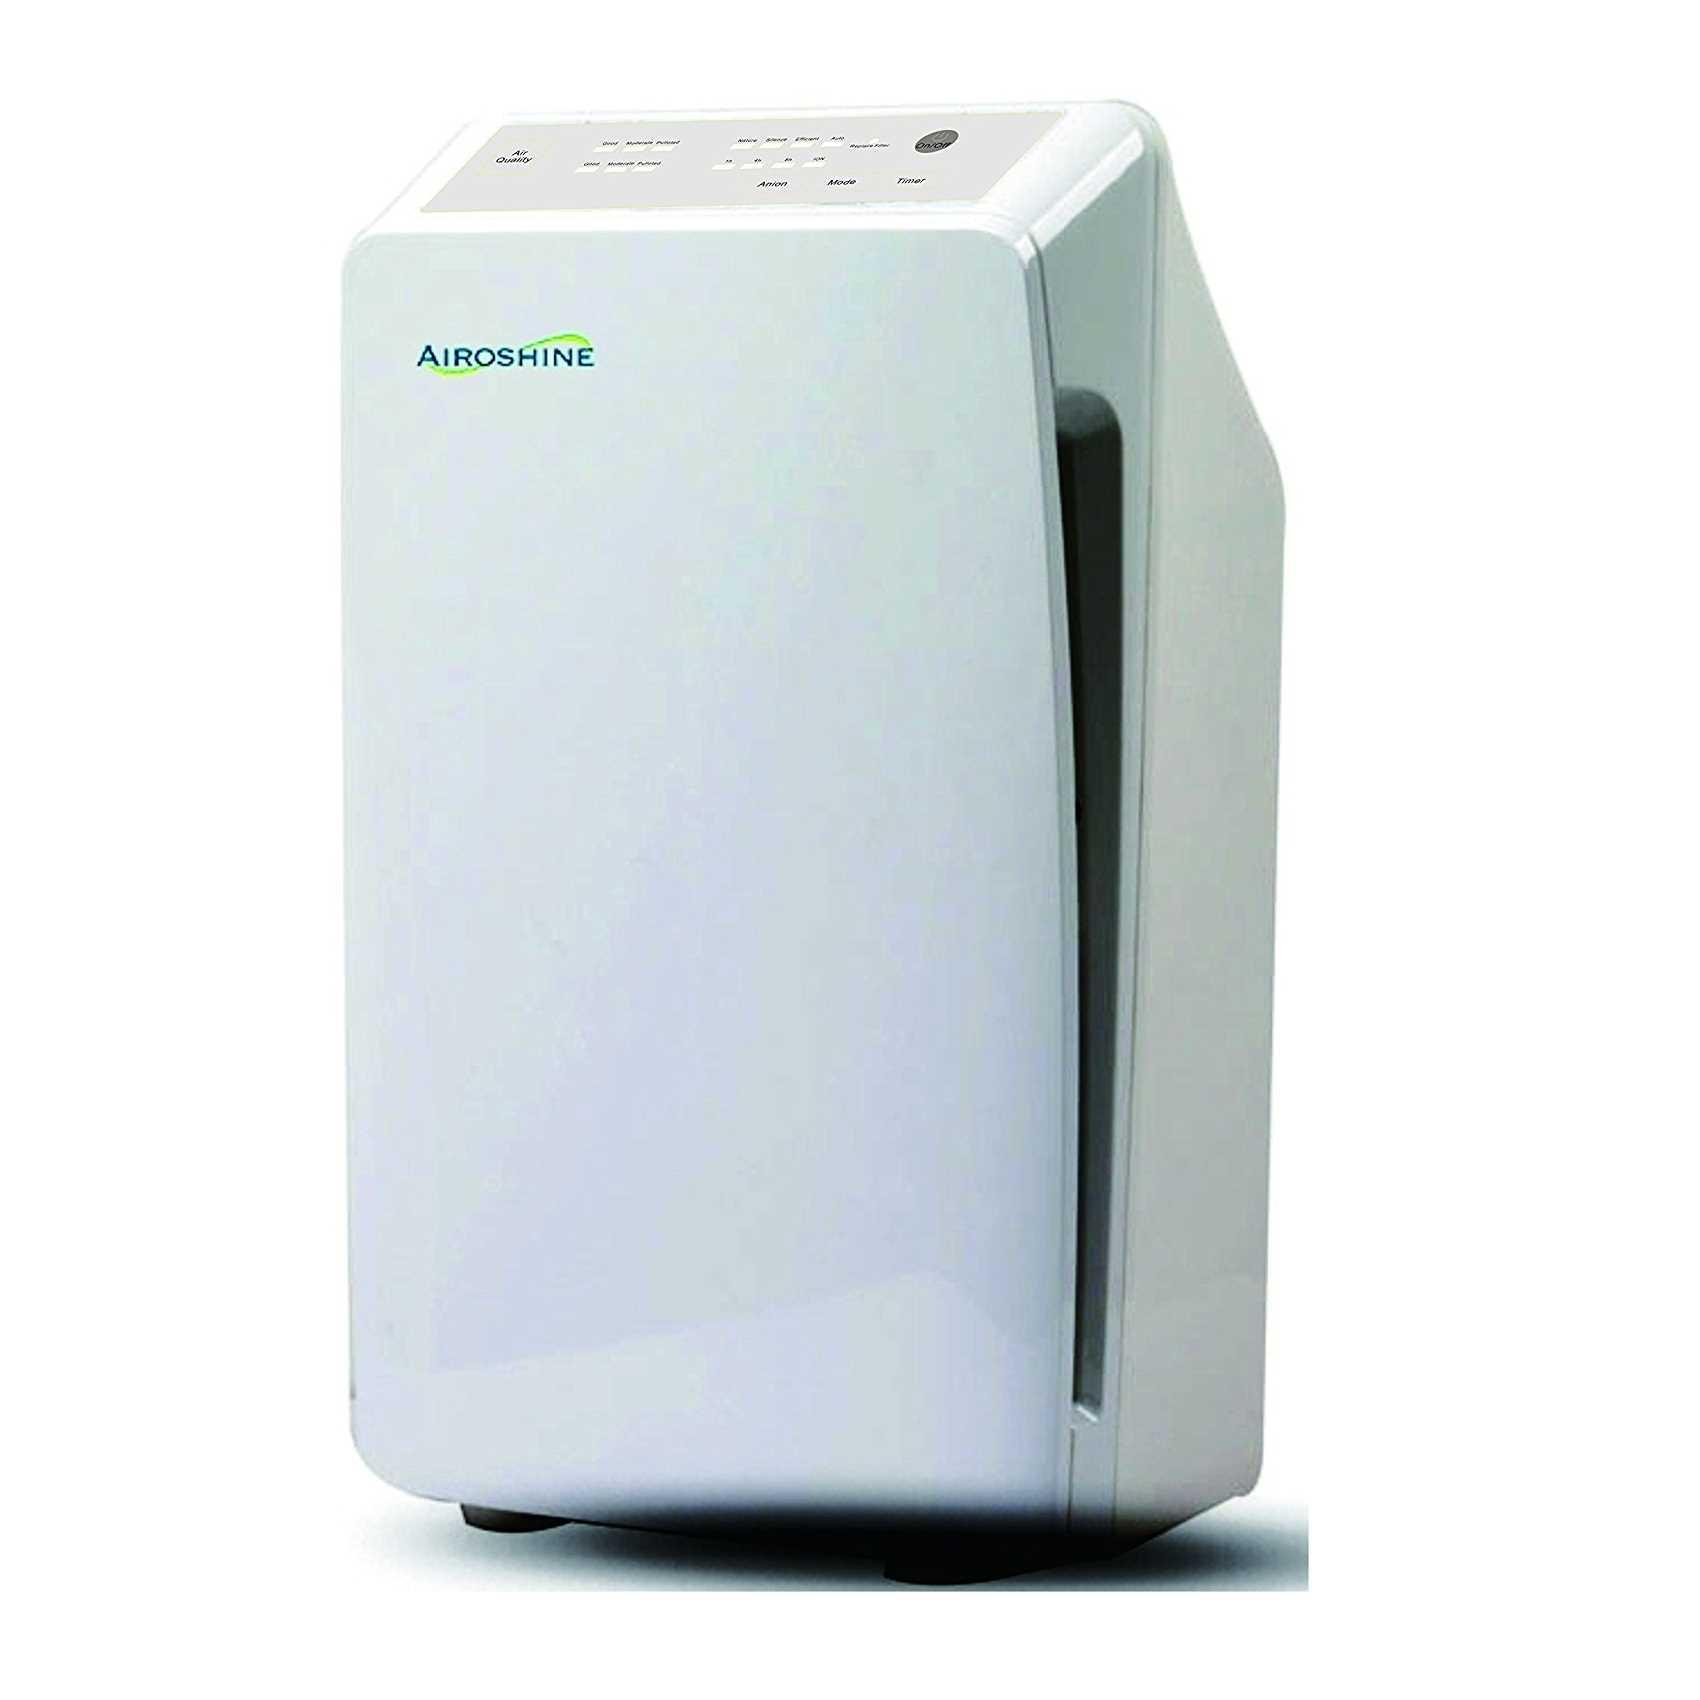 Airoshine KJ-501 Room Air Purifier